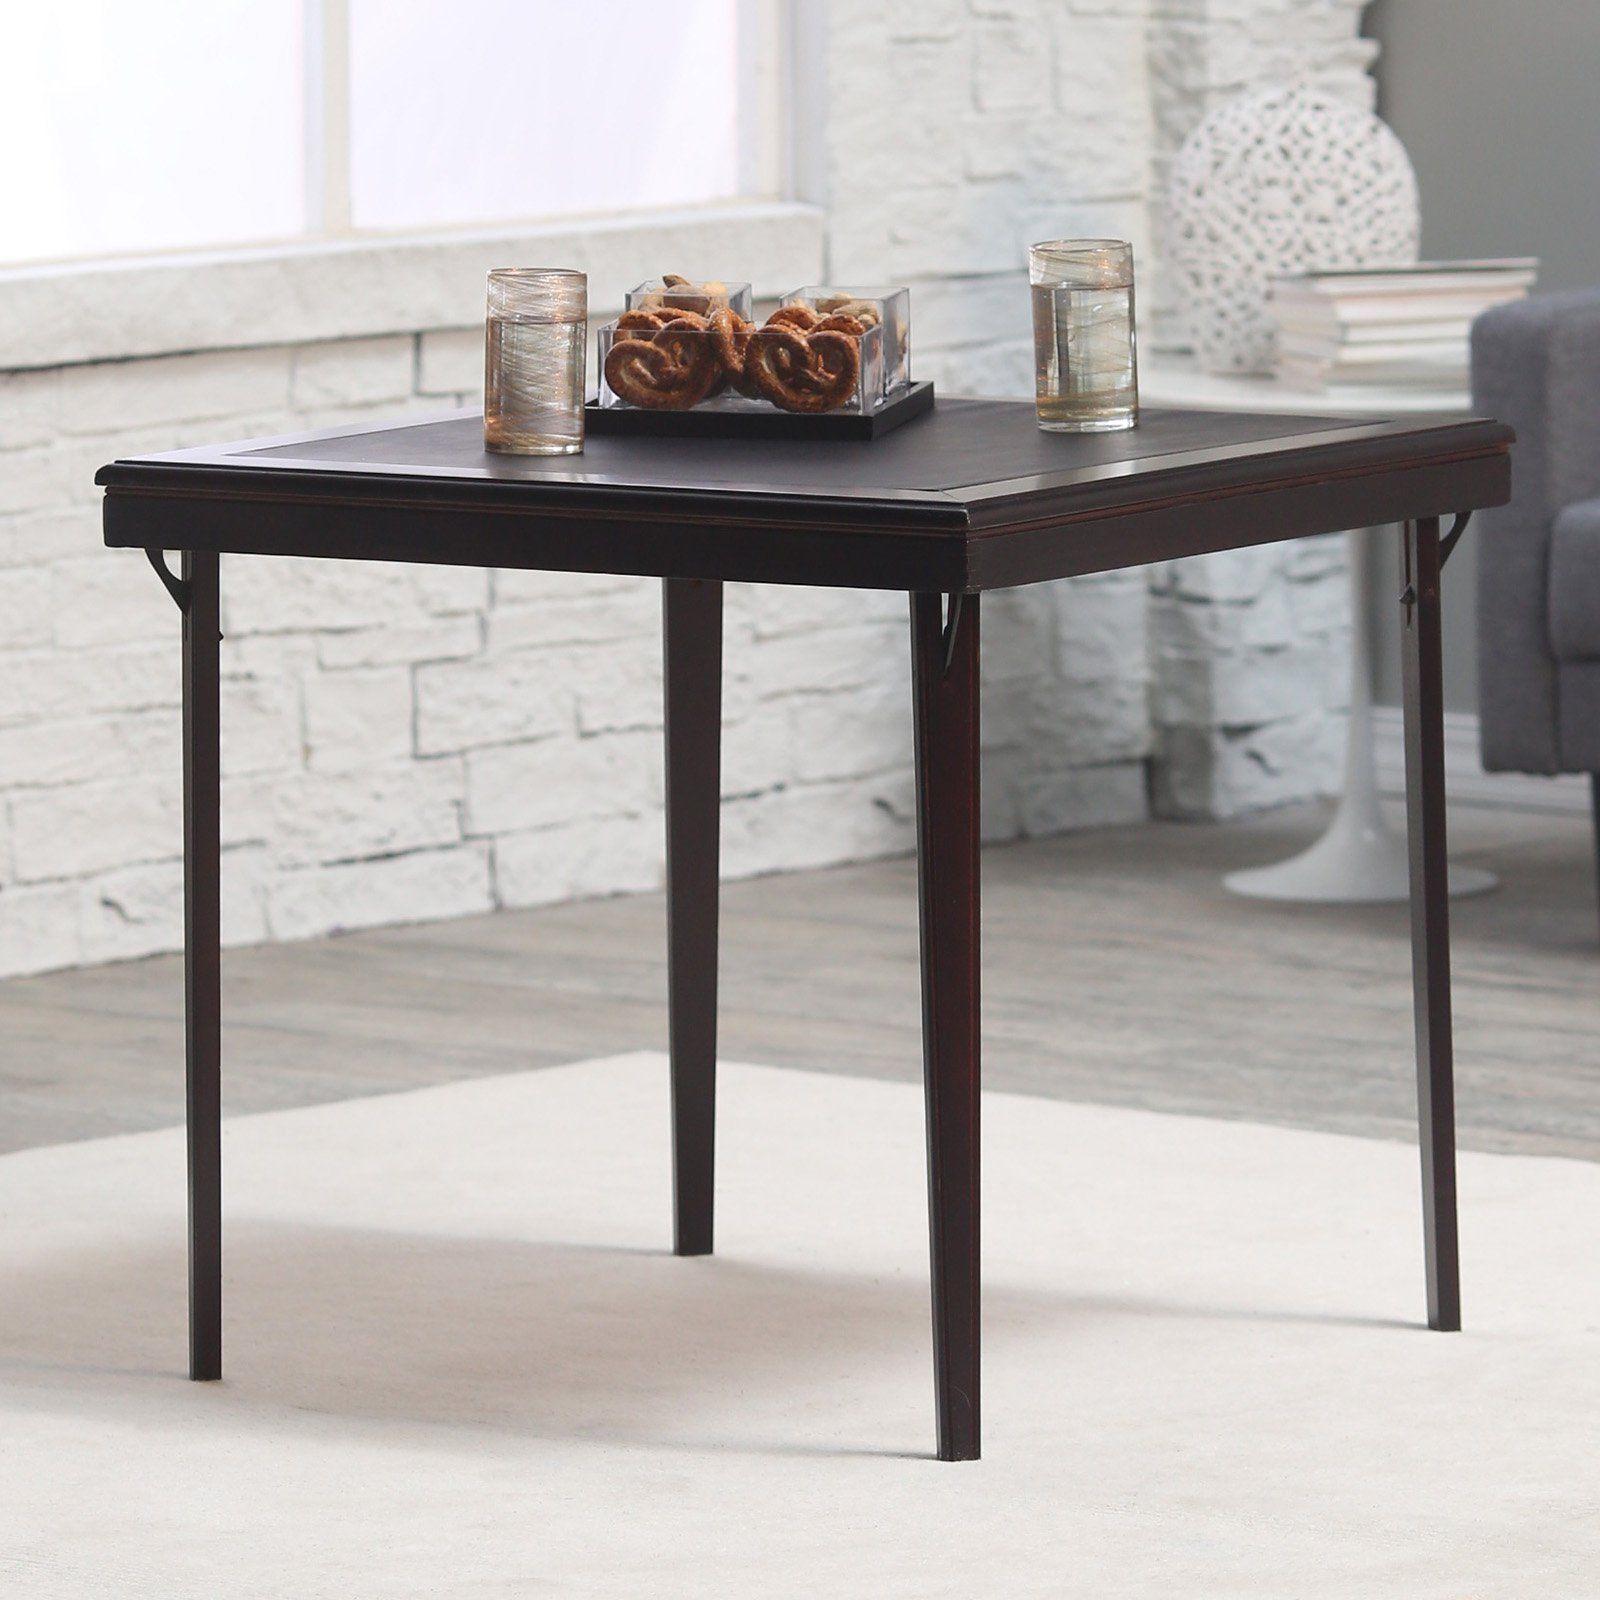 Square Premium Wood Folding Card Table 14260espe